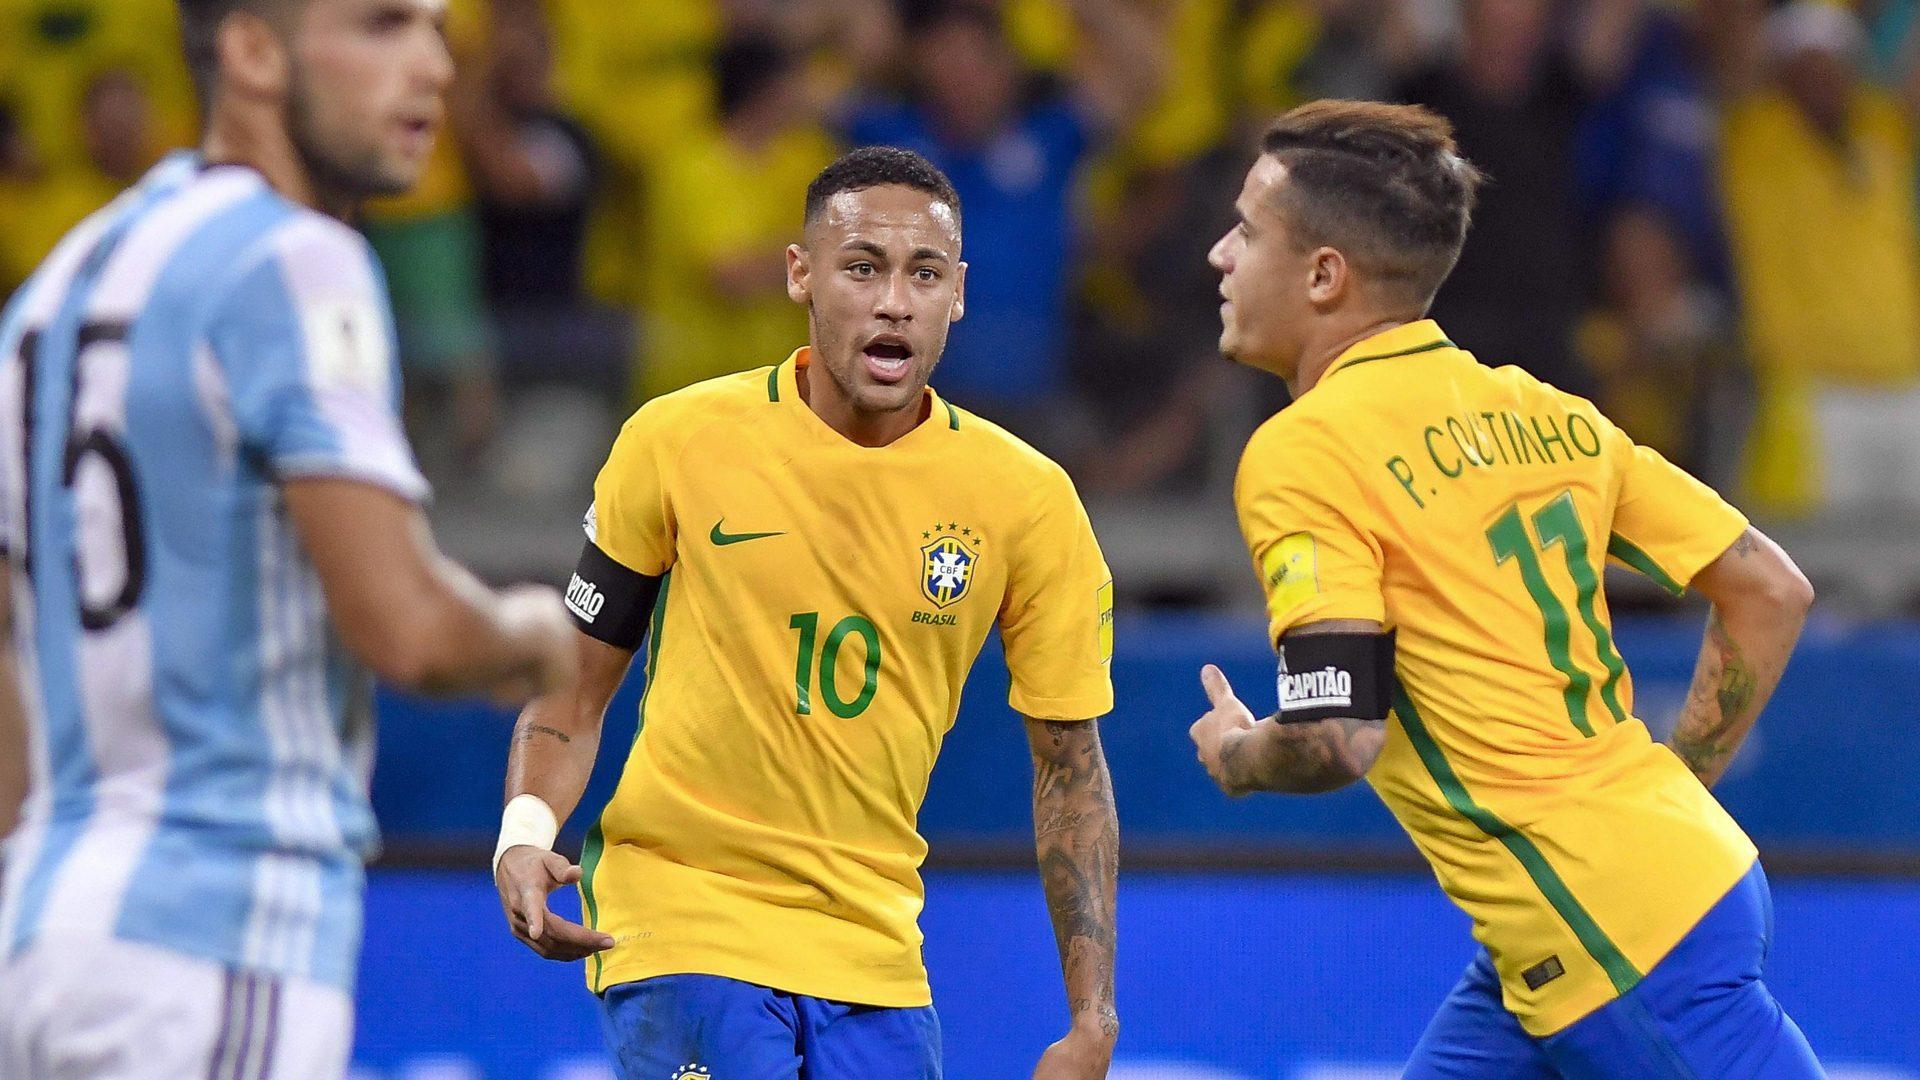 Coutinho v akci za brazilskou reprezentaci.